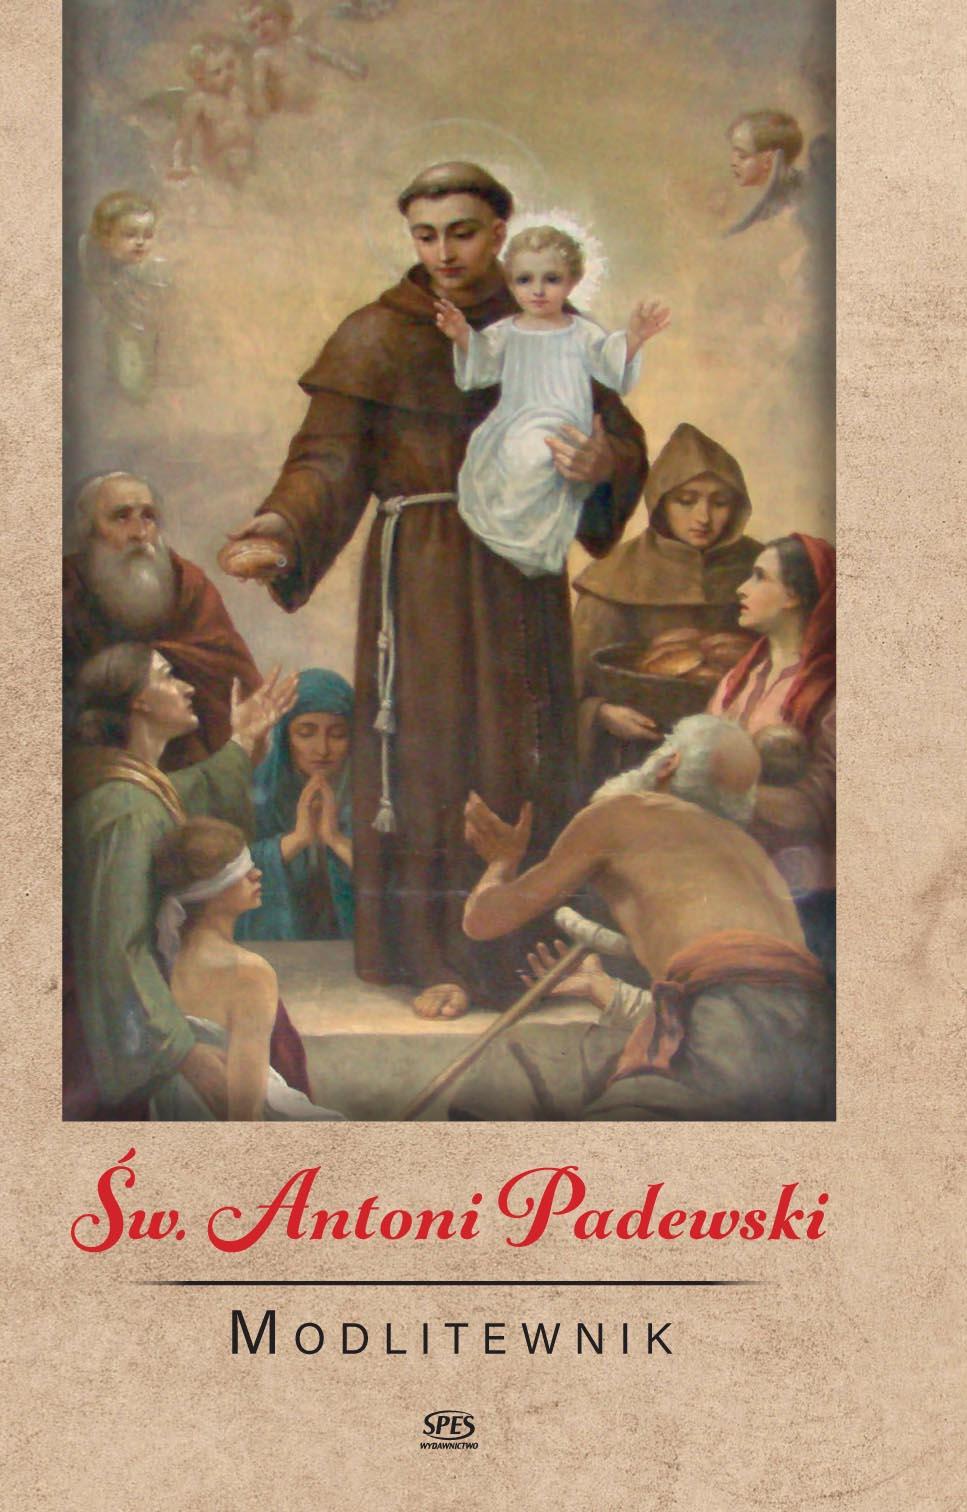 Św. Antoni Padewski modlitewnik